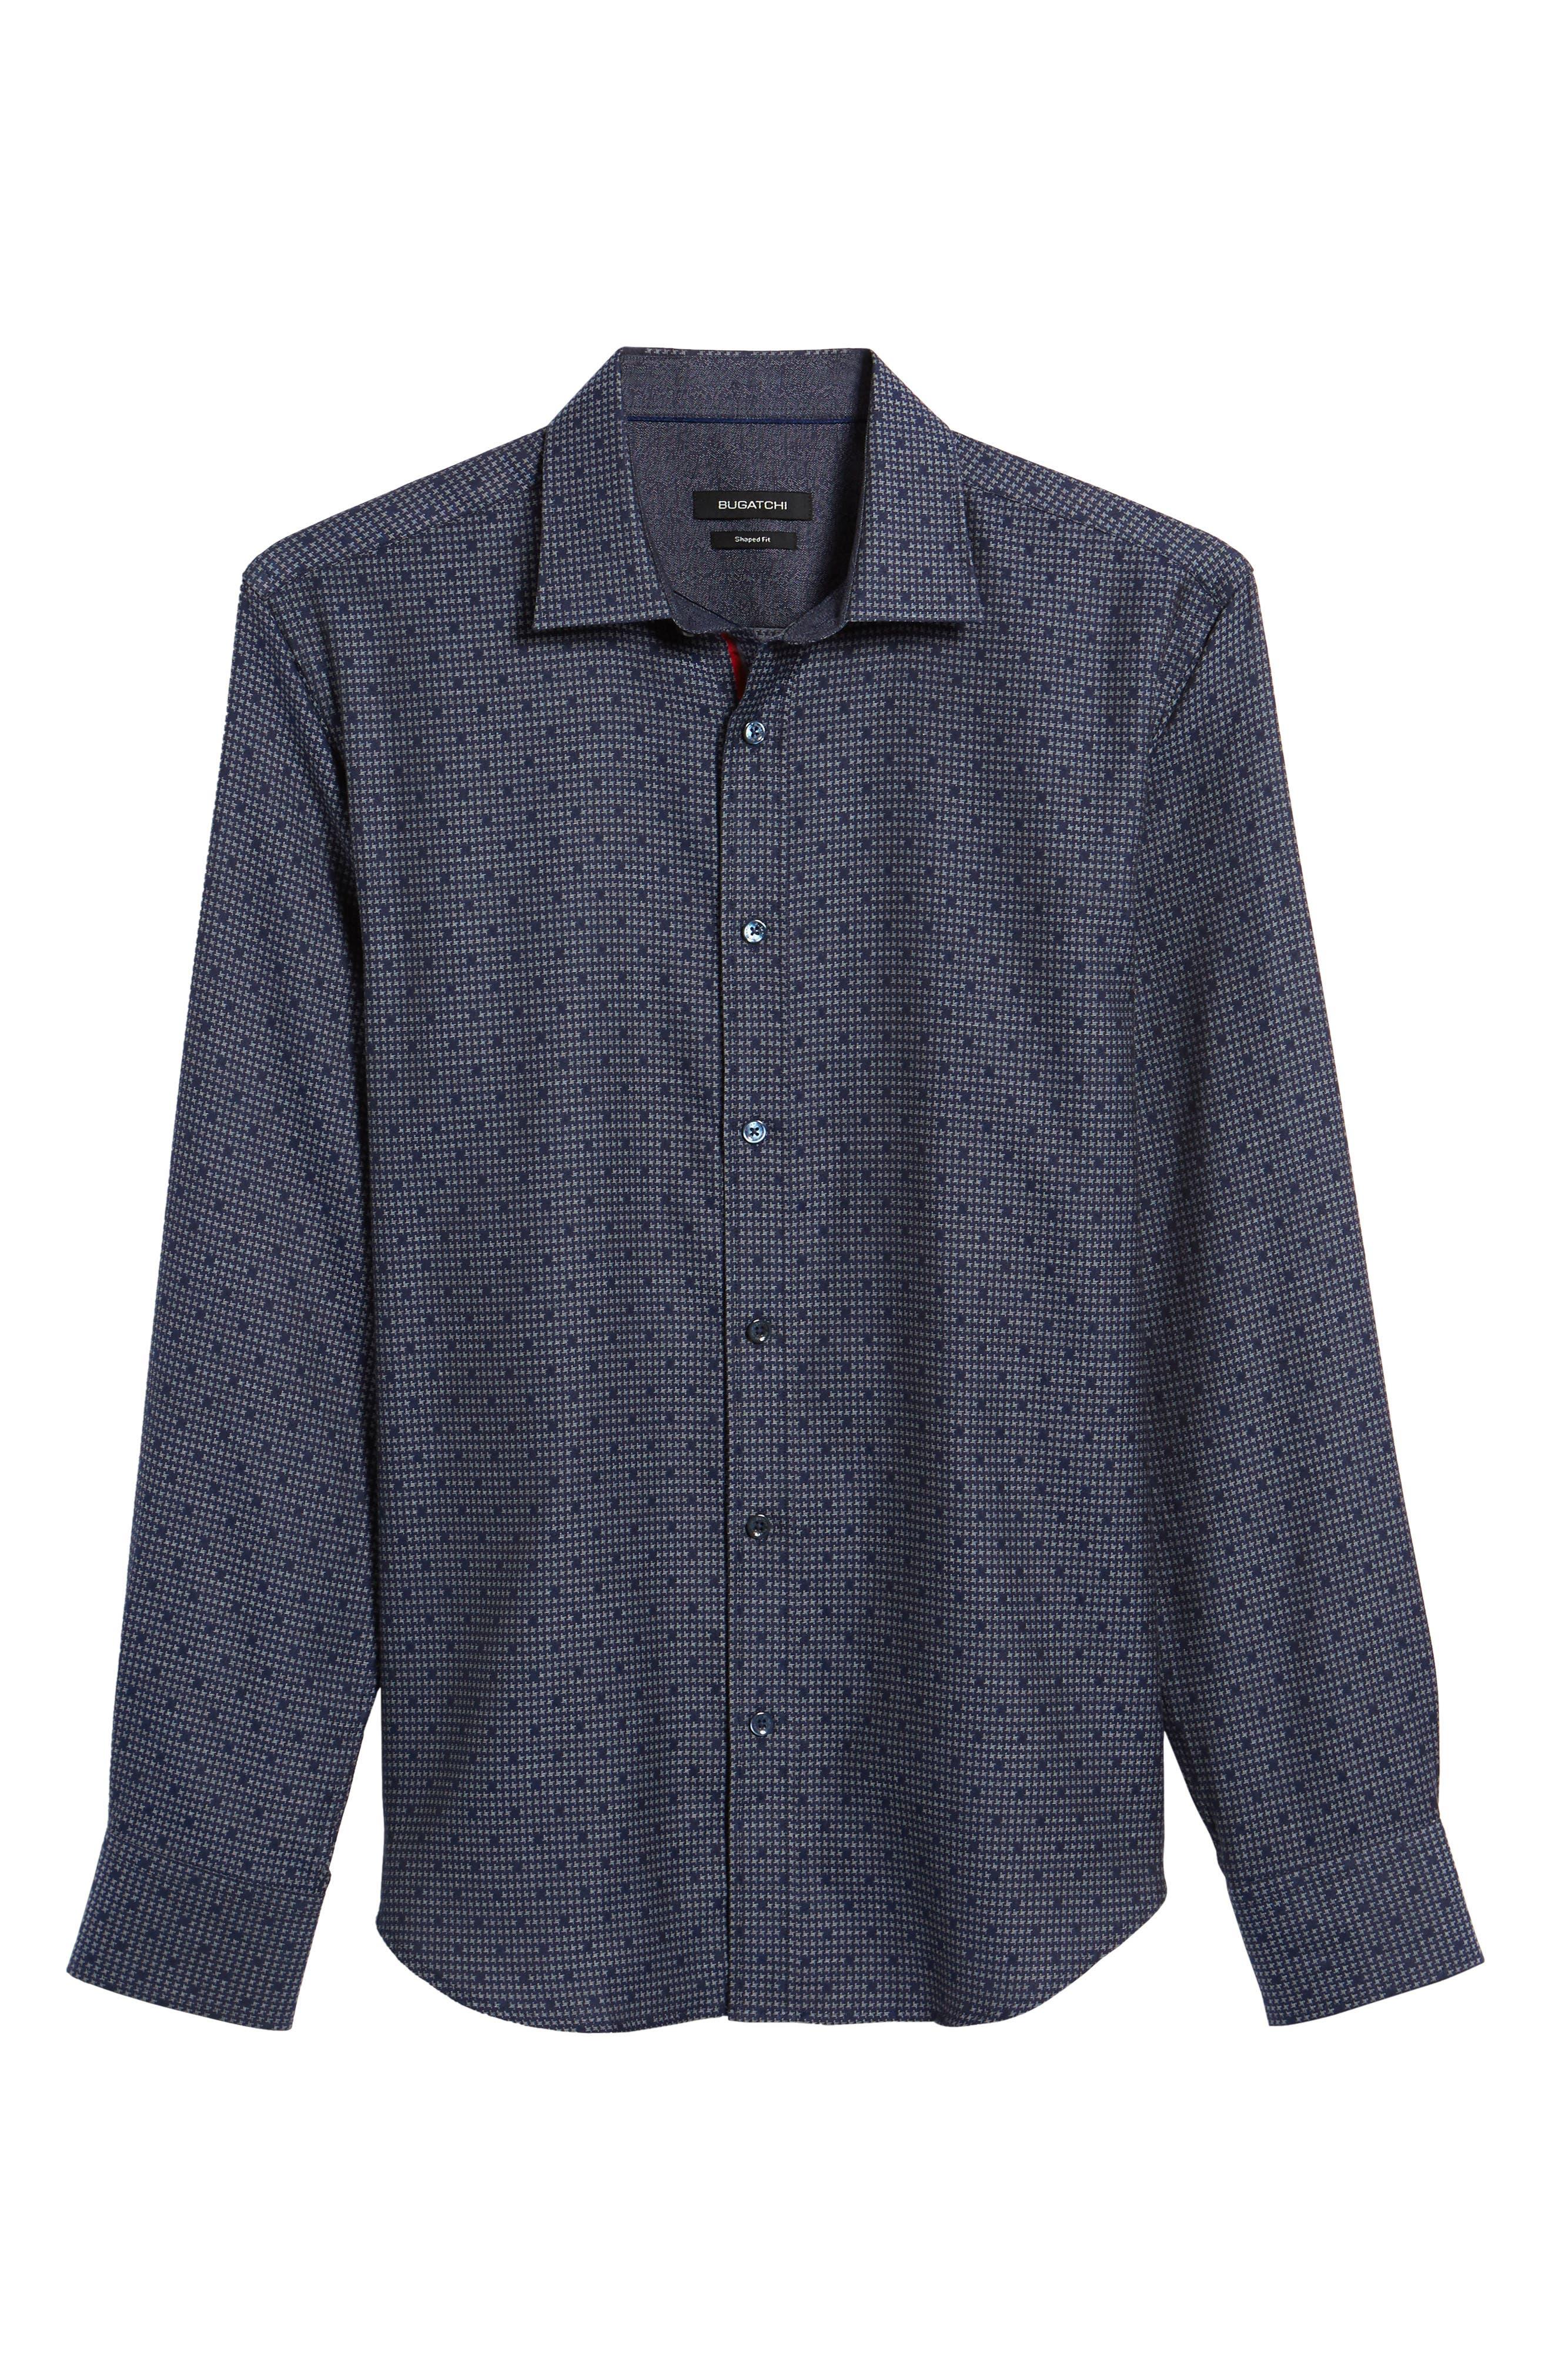 Alternate Image 6  - Bugatchi Trim Fit Dot Houndstooth Sport Shirt